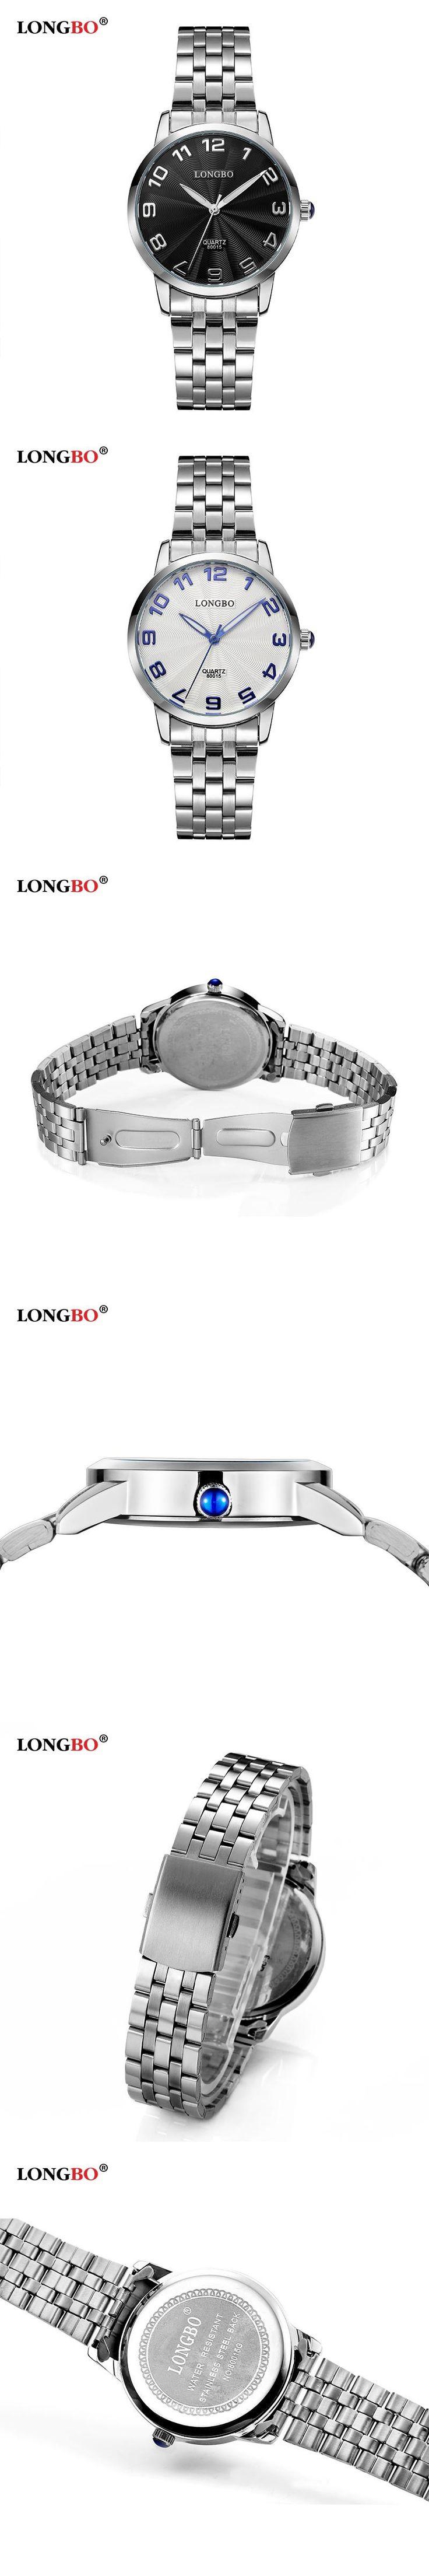 LONGBO New Fashion Watch Men Luxury Stainless Steel Simple Style Casual Business Quartz Watch Popular High-quality Elegant Clock